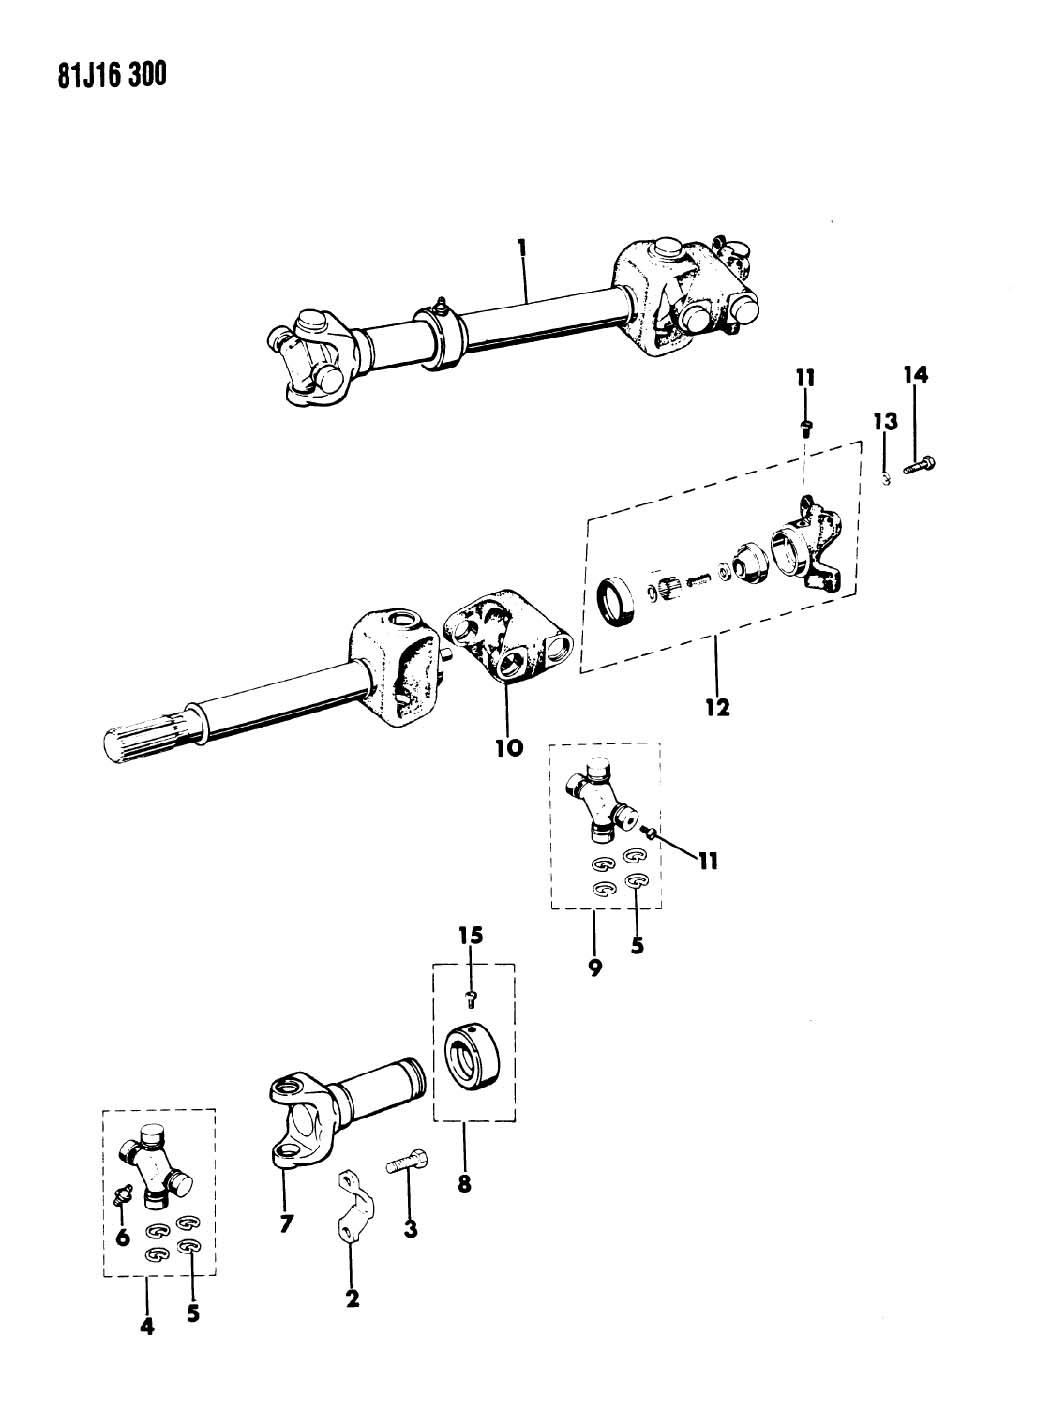 Jeep Wrangler Yoke Drive Shaft Selec Trac Full Time 4wd